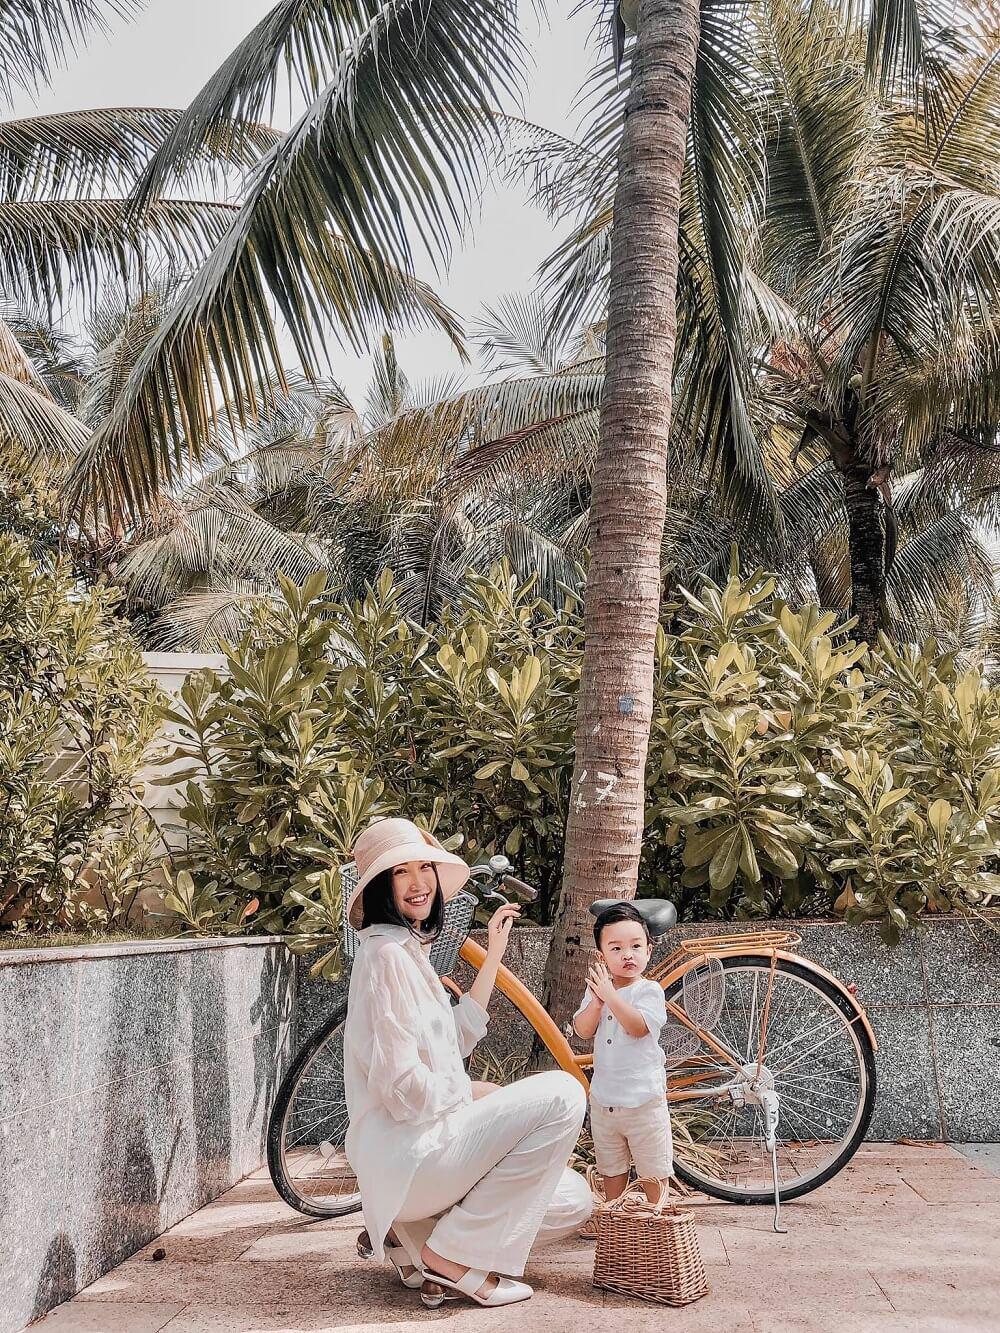 Premier Village Danang Resort Managed By Accorhotels Review Kinh Nghiem Du Lich Da Nang Cho Gia Dinh Co Con Nho Danang Fantasticity Com 02